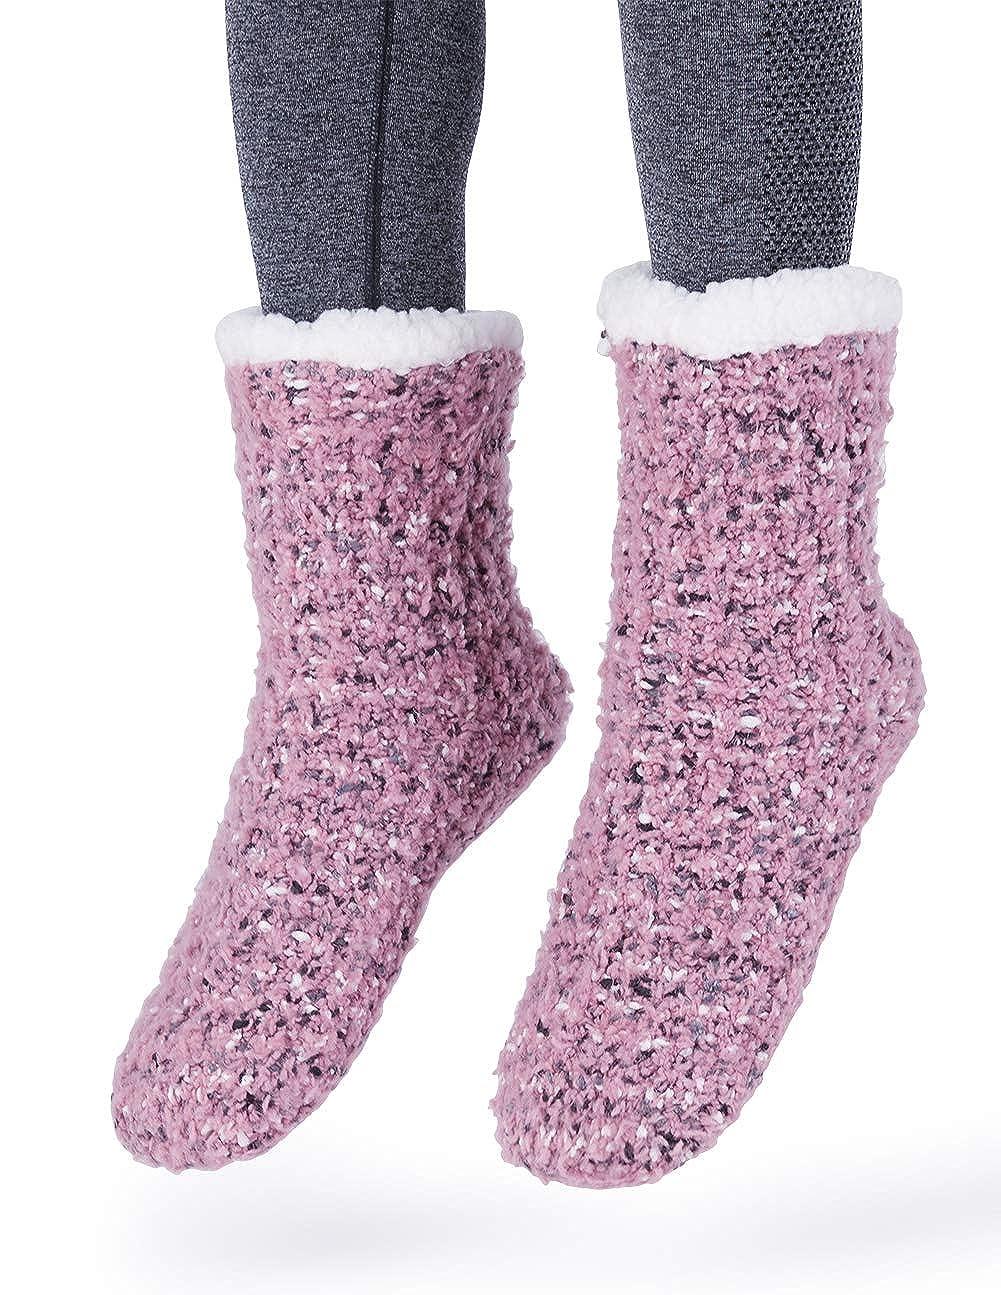 6a17365453f MaaMgic Womens Fuzzy Slipper Socks Girls Cozy Funny Grip Socks Black  4713071072000